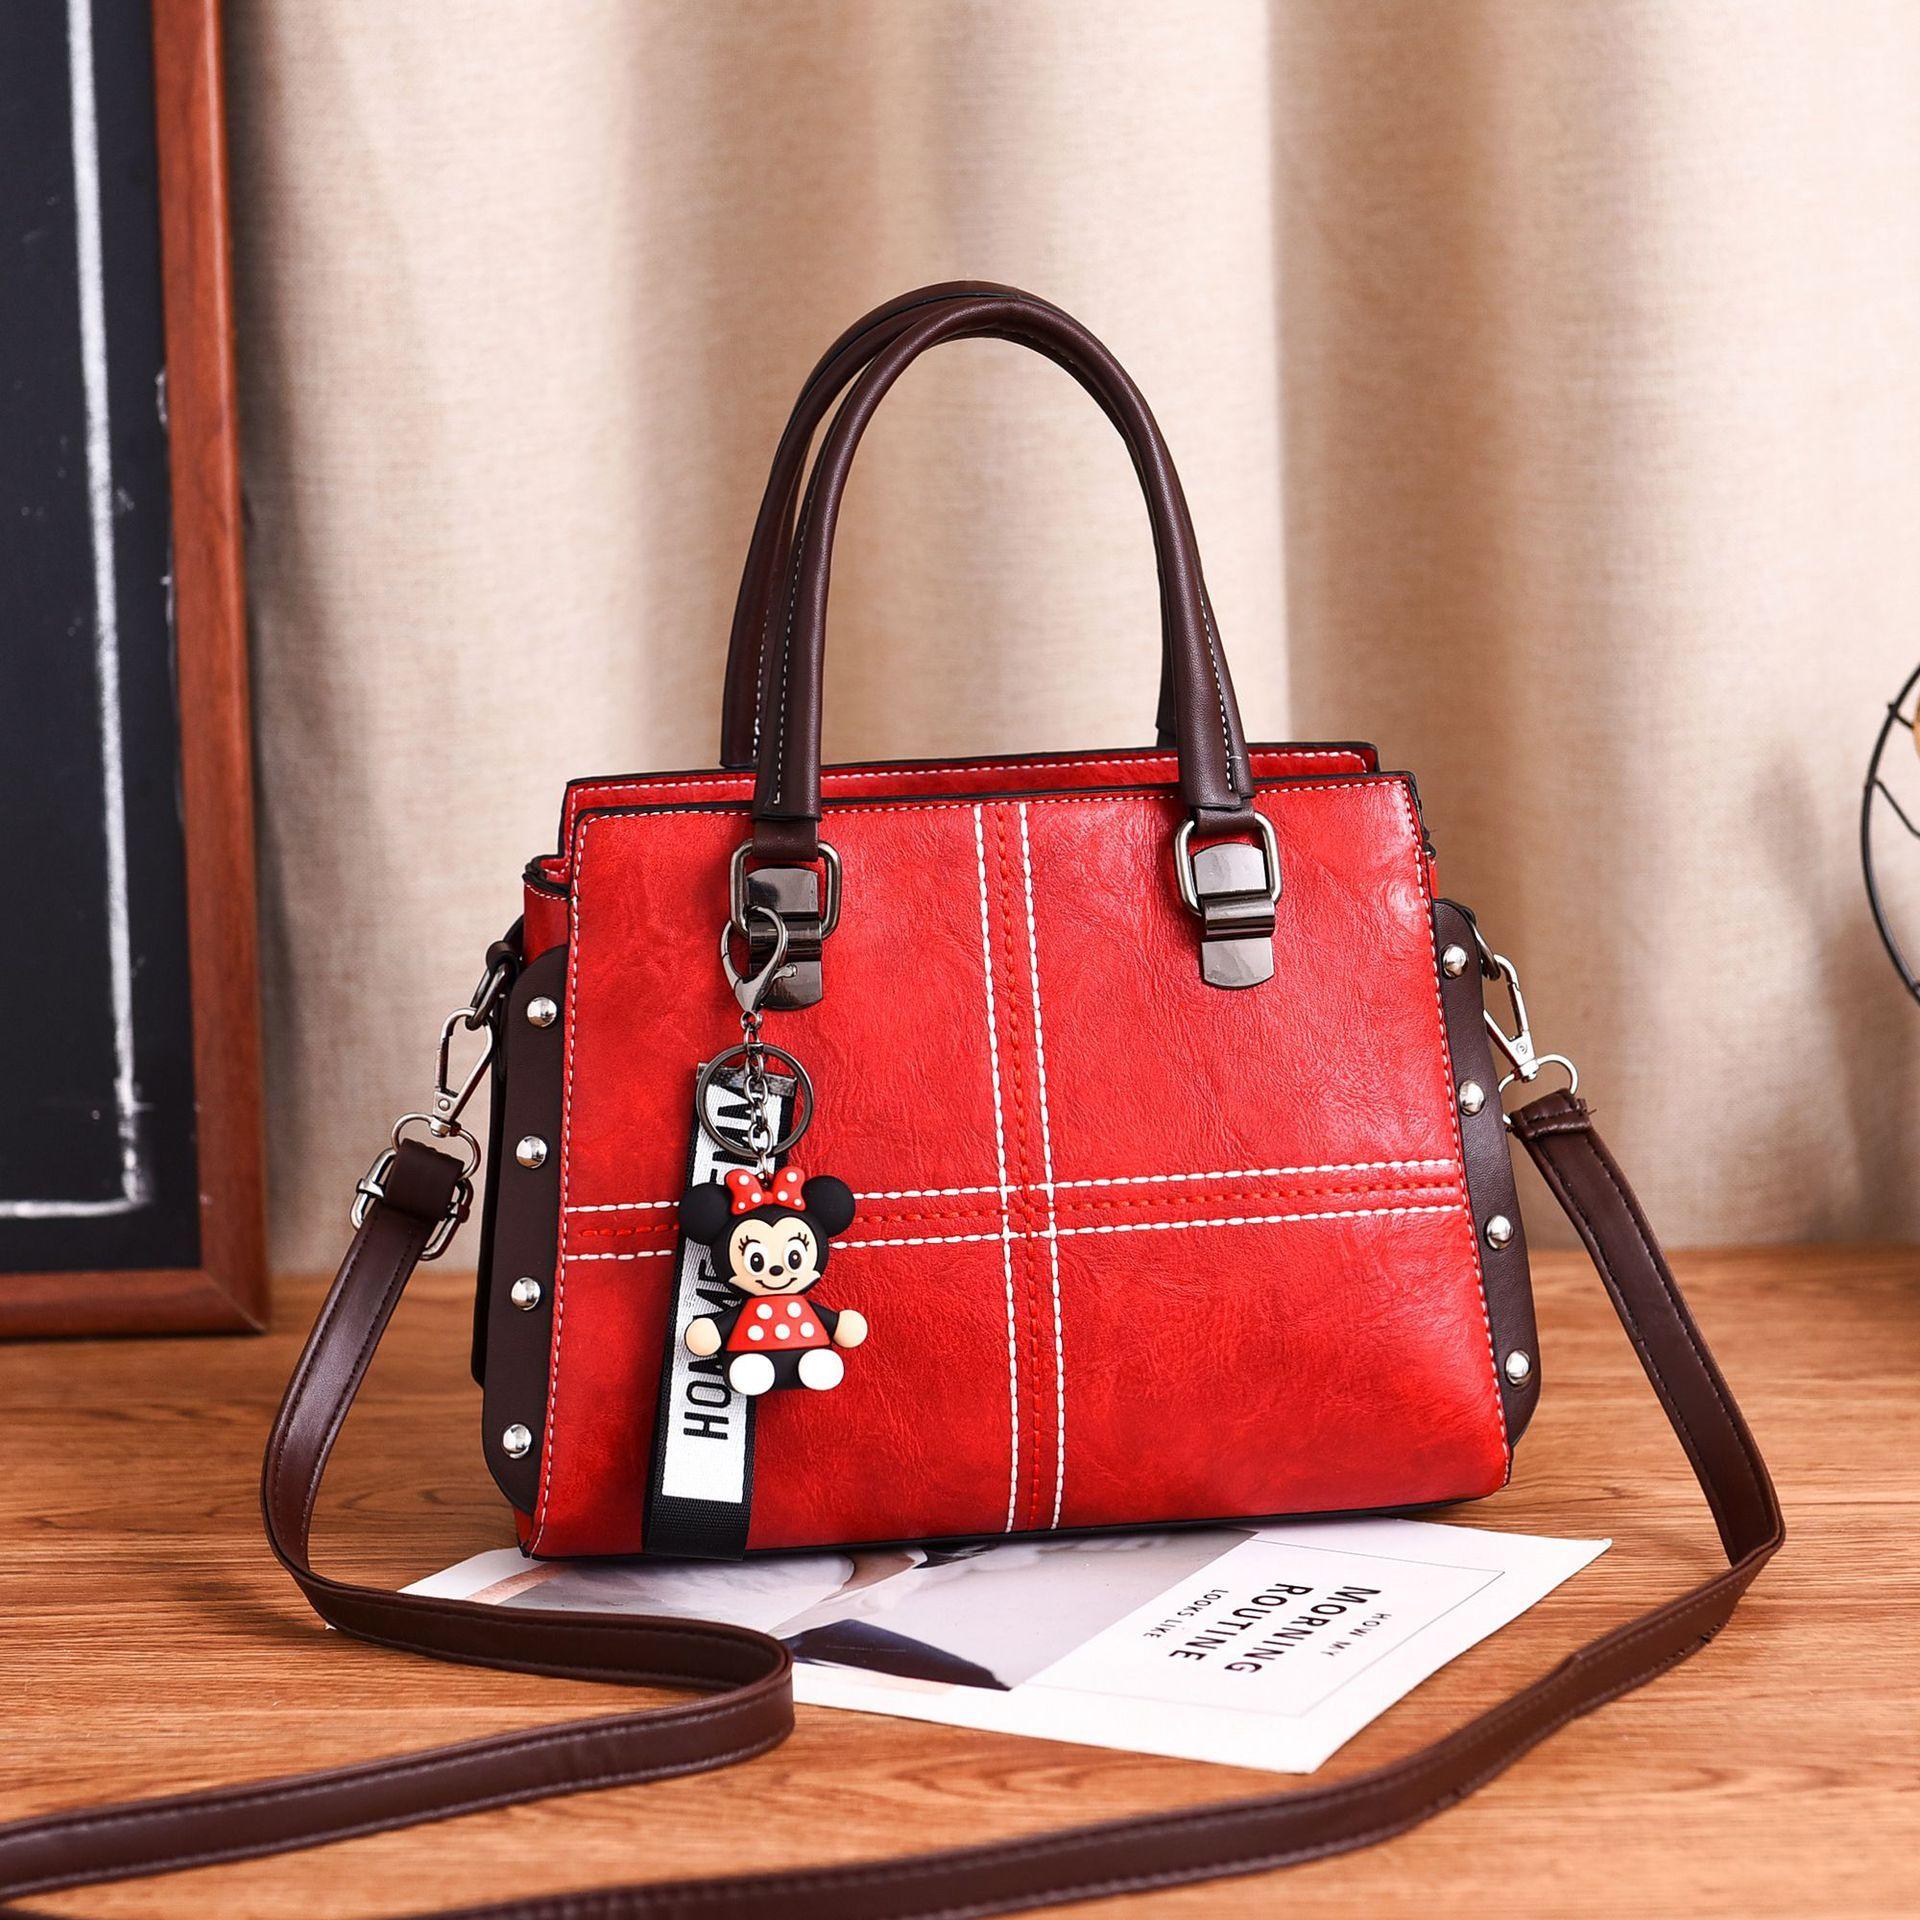 8133ea4356df Pink Sugao Women New Fashion Handbags Luxury Handbags Sweet Crossbody  Handbag Designer Messeger Bag New Style Handbags Of Factory Outlet Patricia  Nash ...